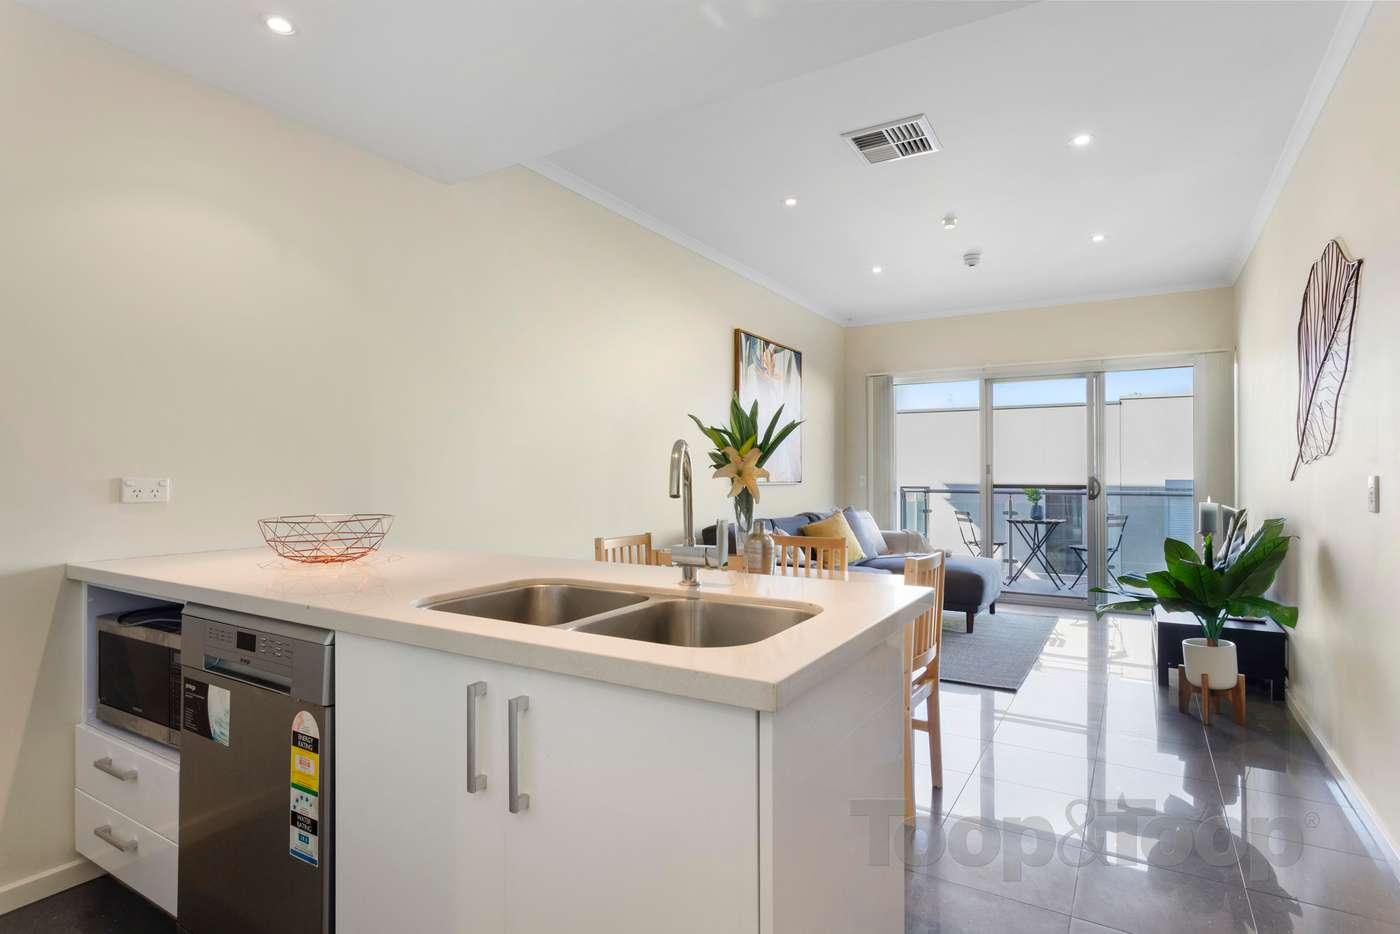 Main view of Homely apartment listing, 5/103 Elder Drive, Mawson Lakes SA 5095